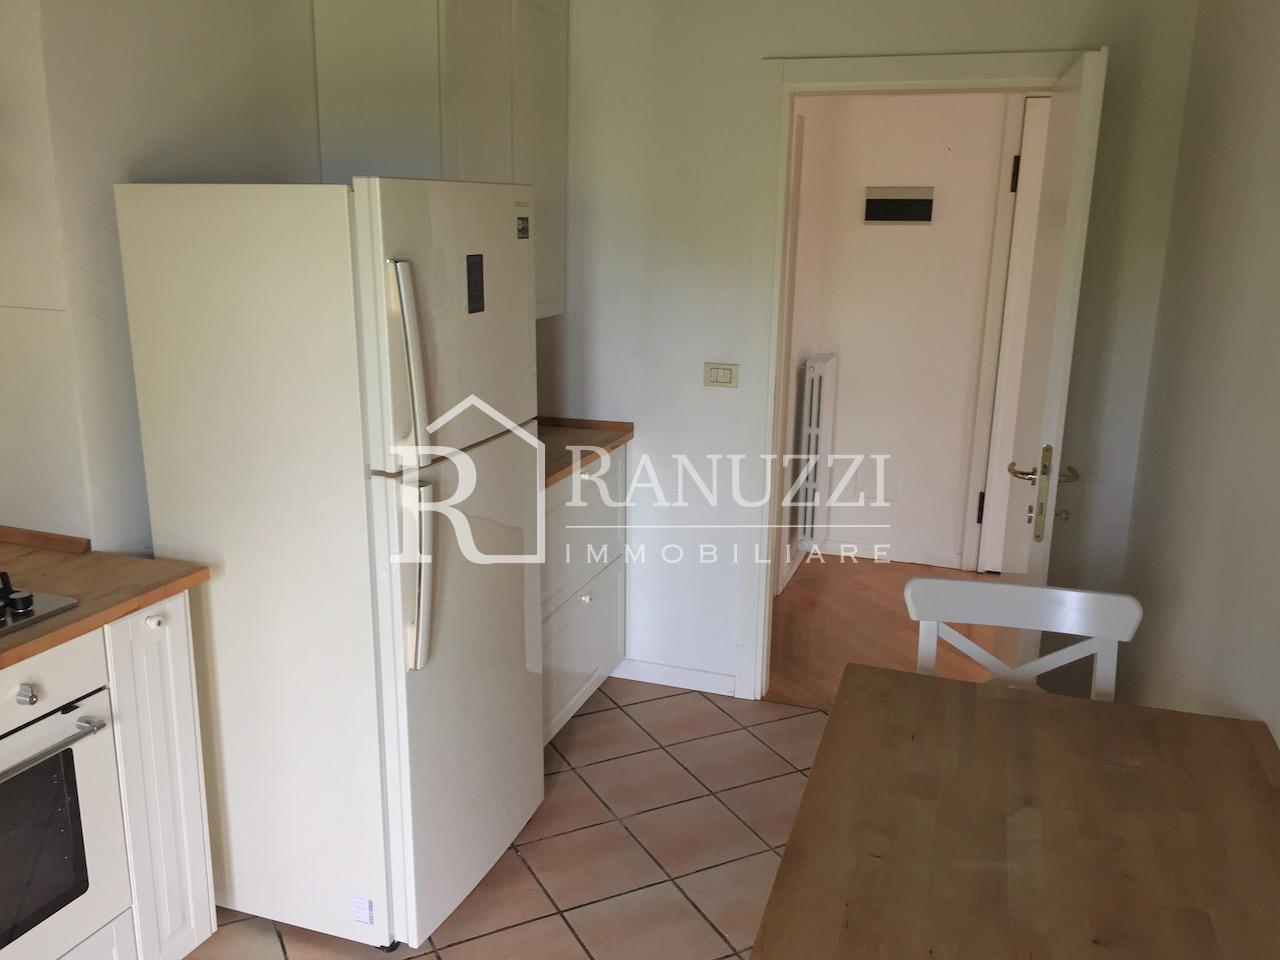 Gessaroli_cucina abitabile